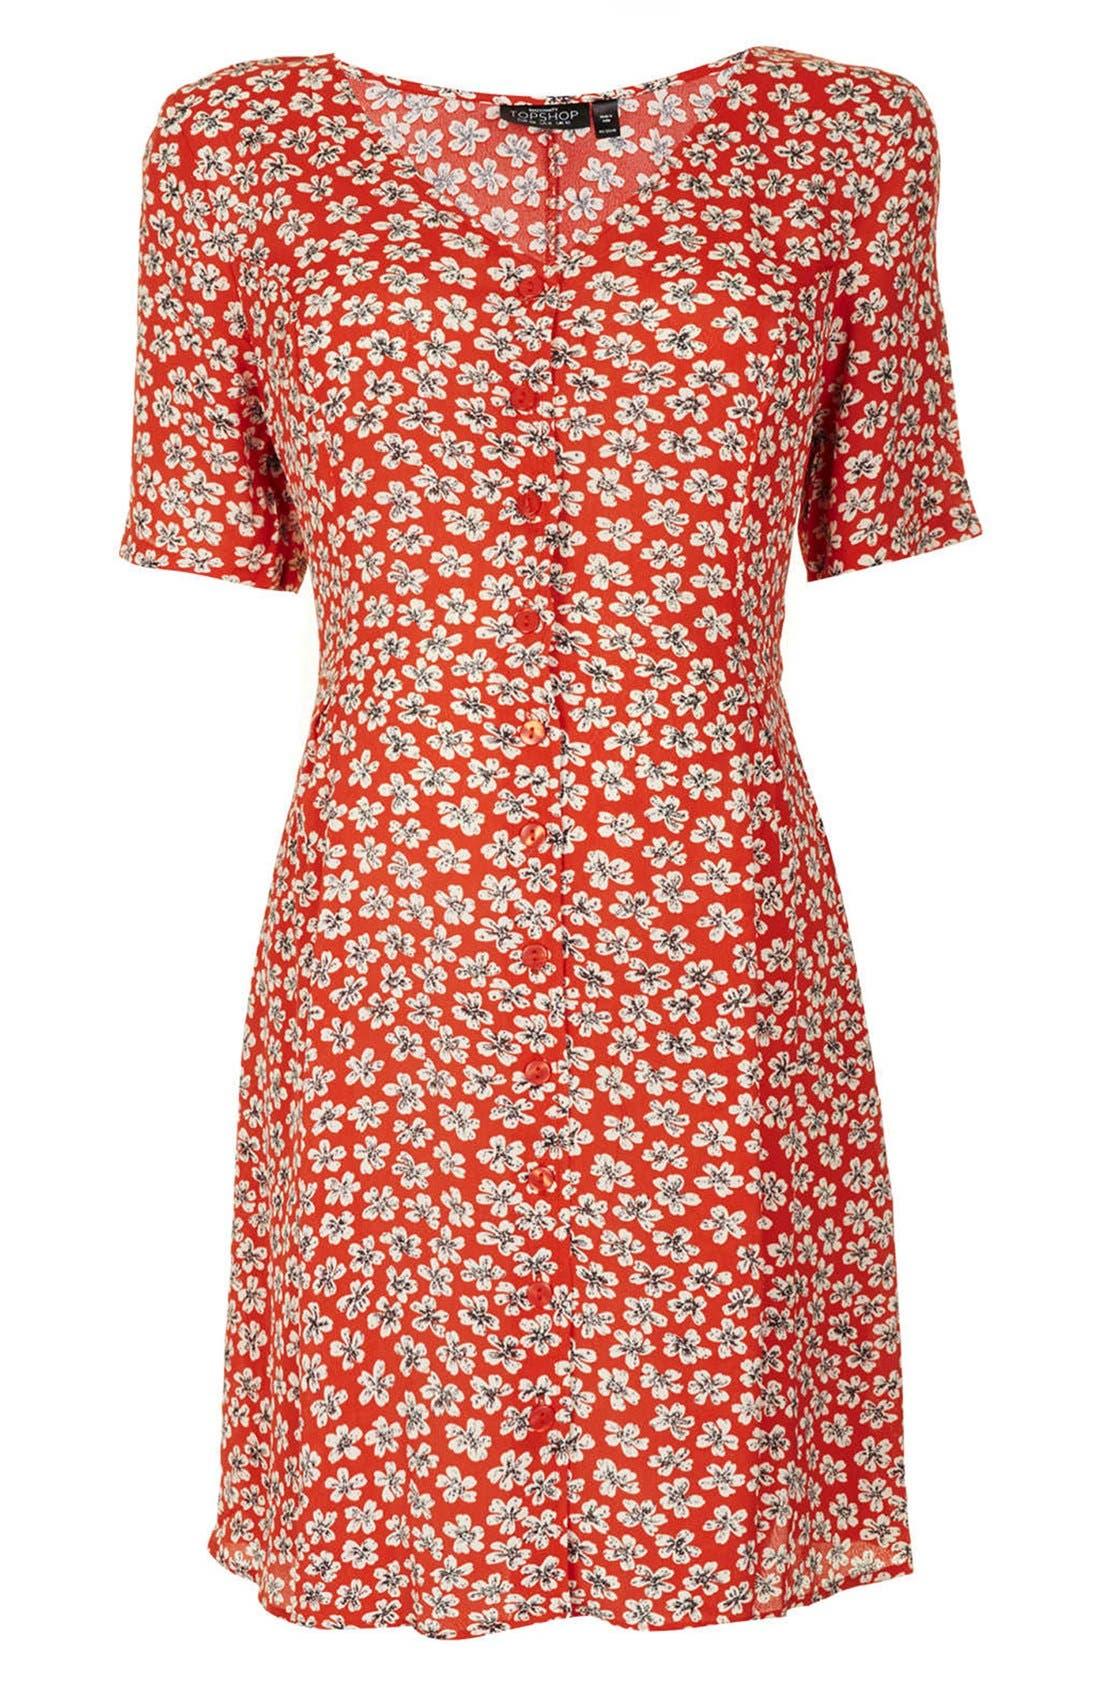 Alternate Image 1 Selected - Topshop 'Daisy' Floral Maternity Tea Dress